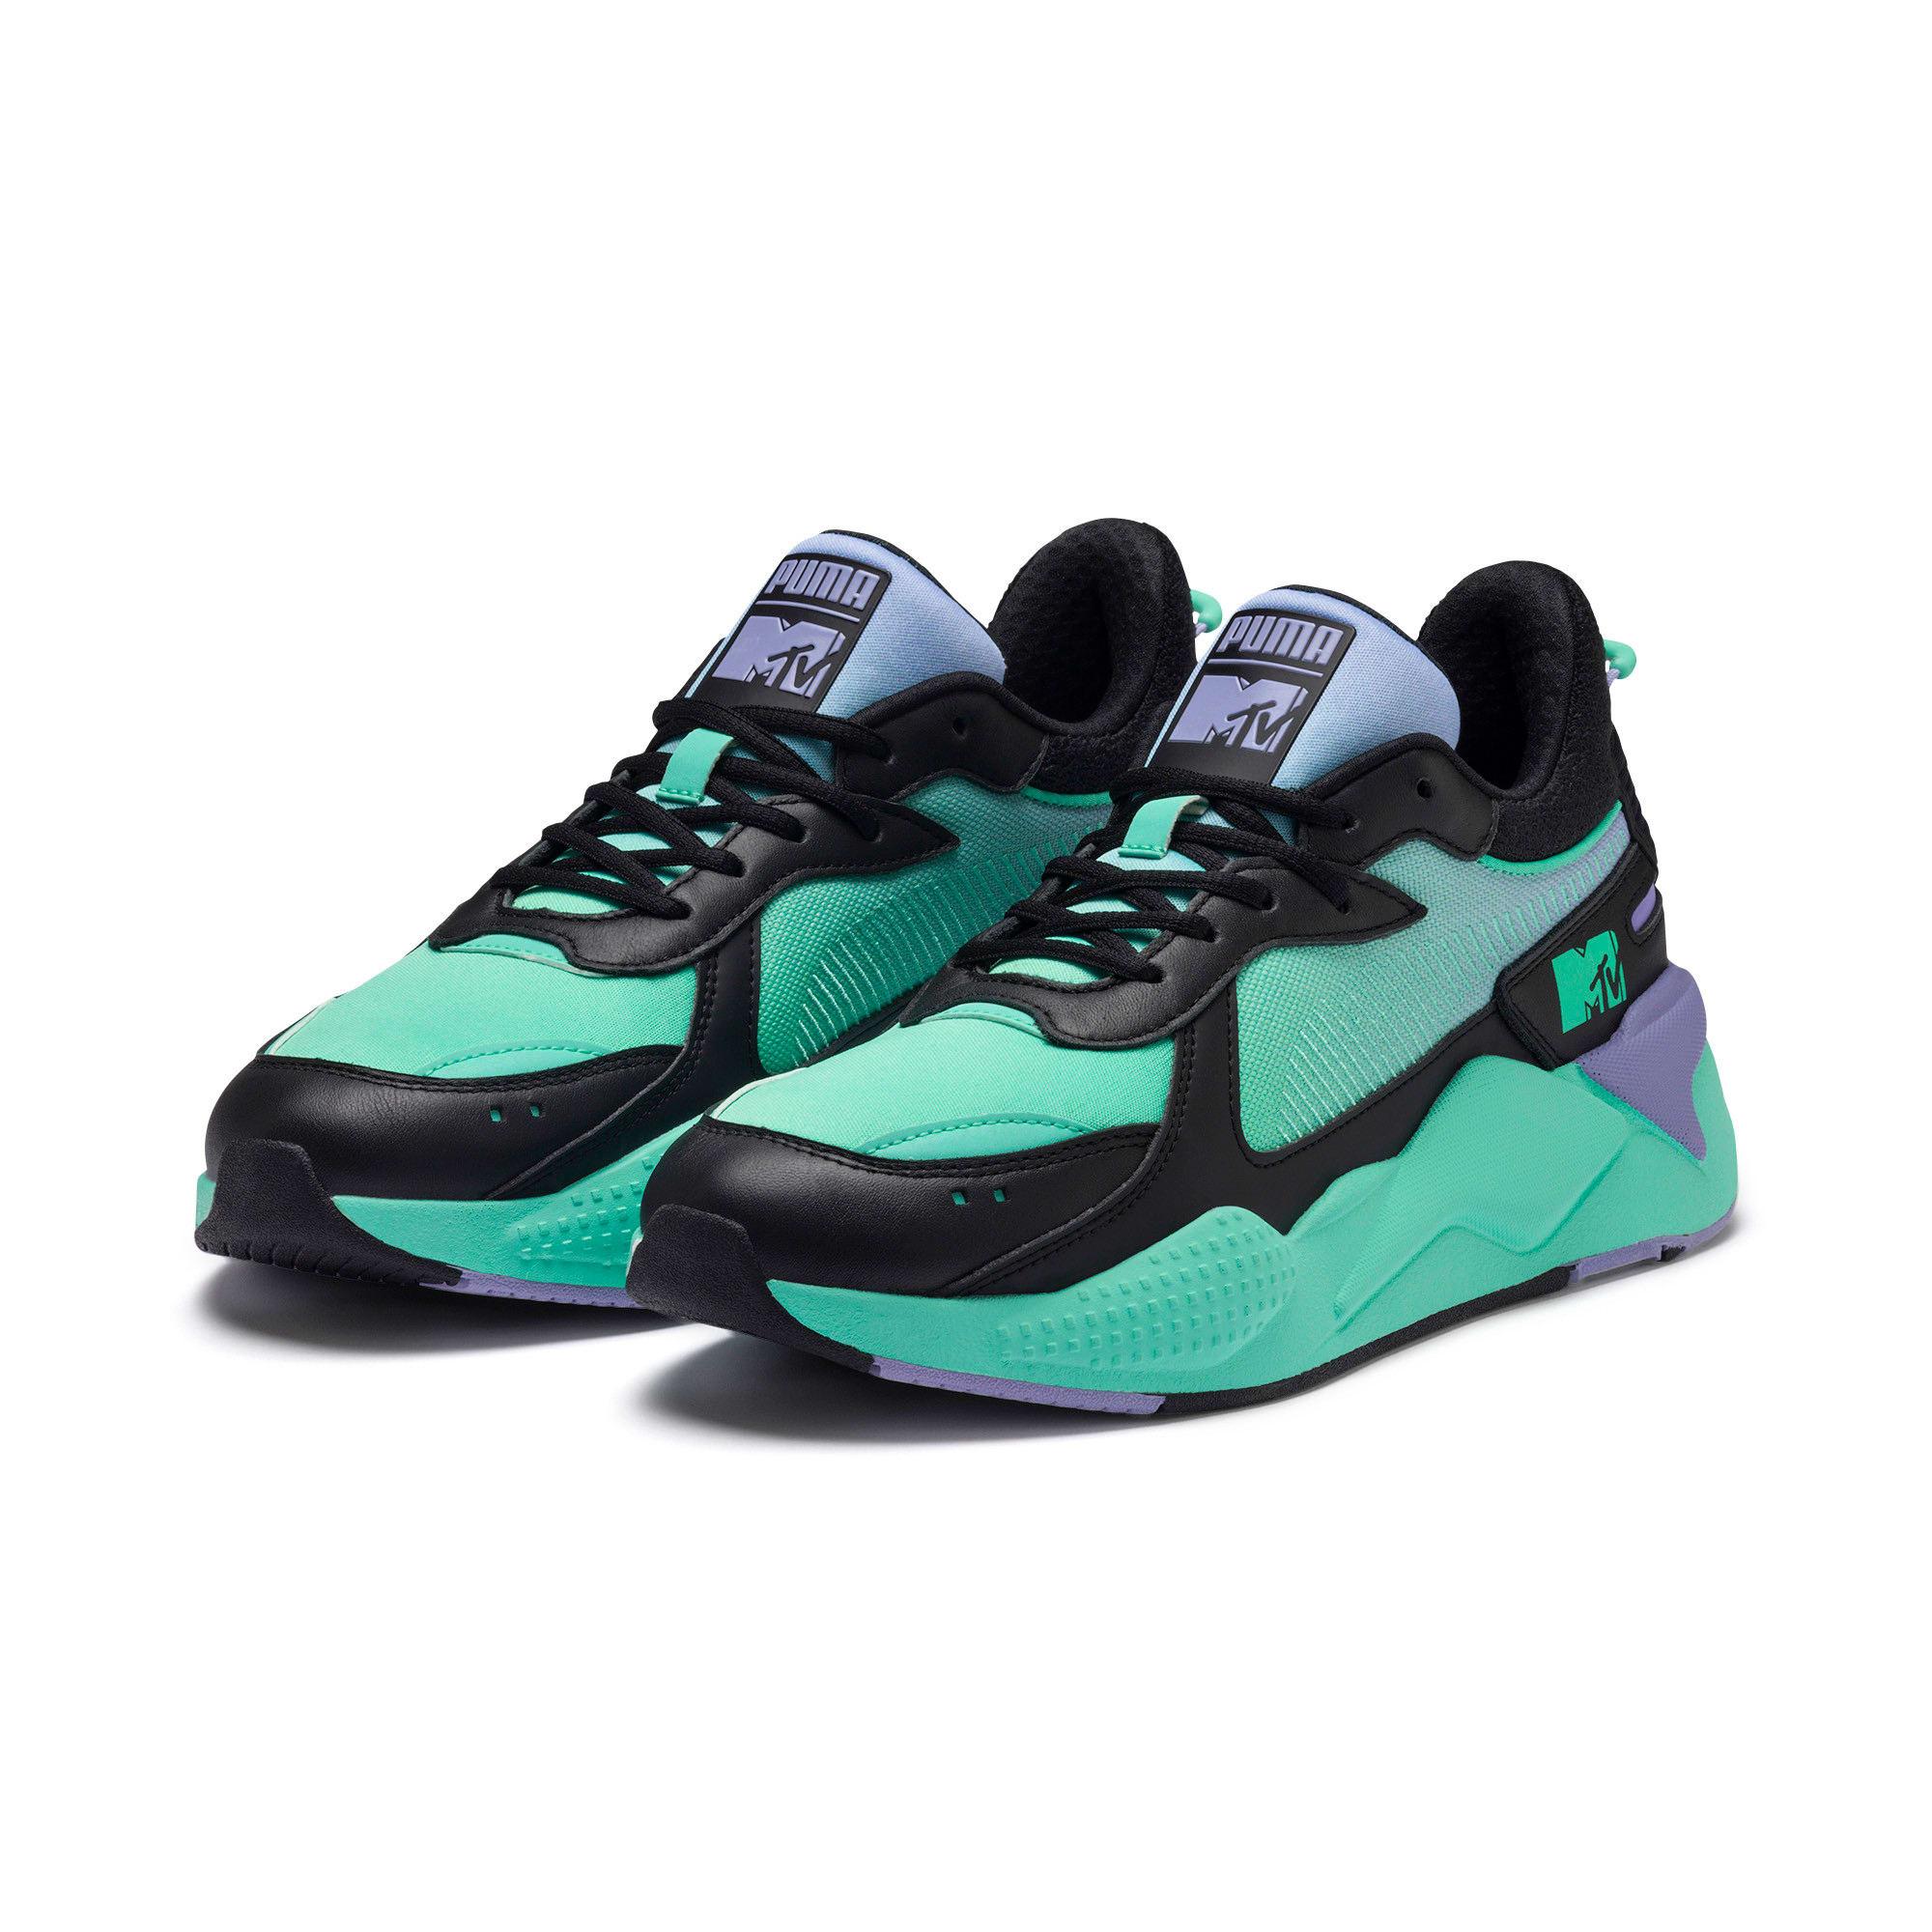 Thumbnail 2 of RS-X Tracks MTV Gradient Gloom Sneakers, Puma Black-Sweet Lavender, medium